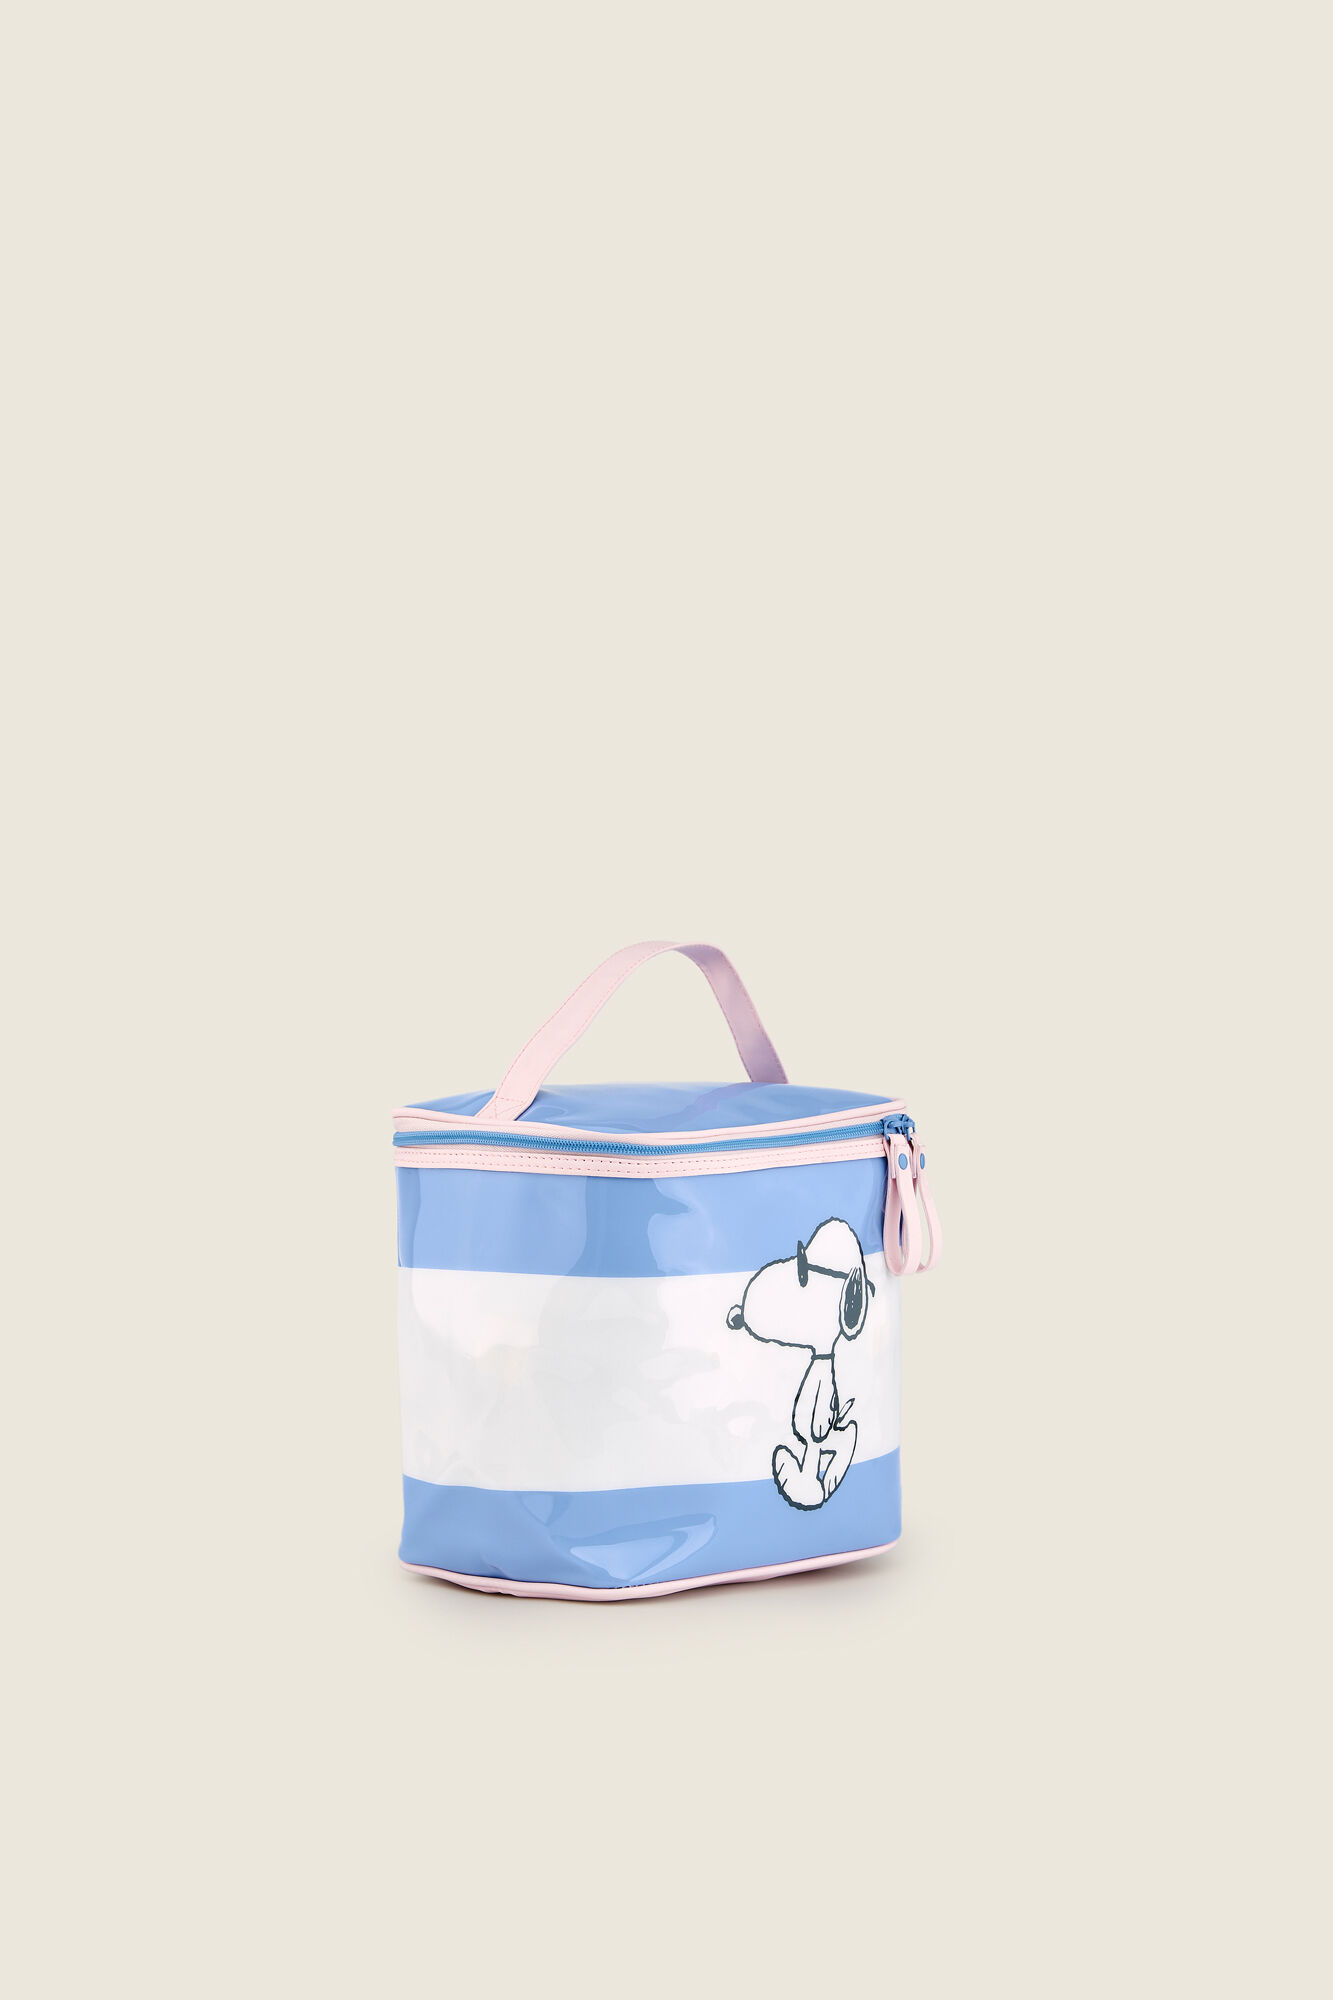 89ce0f72d Neceser grande Snoopy con asa | Neceseres | Women'secret